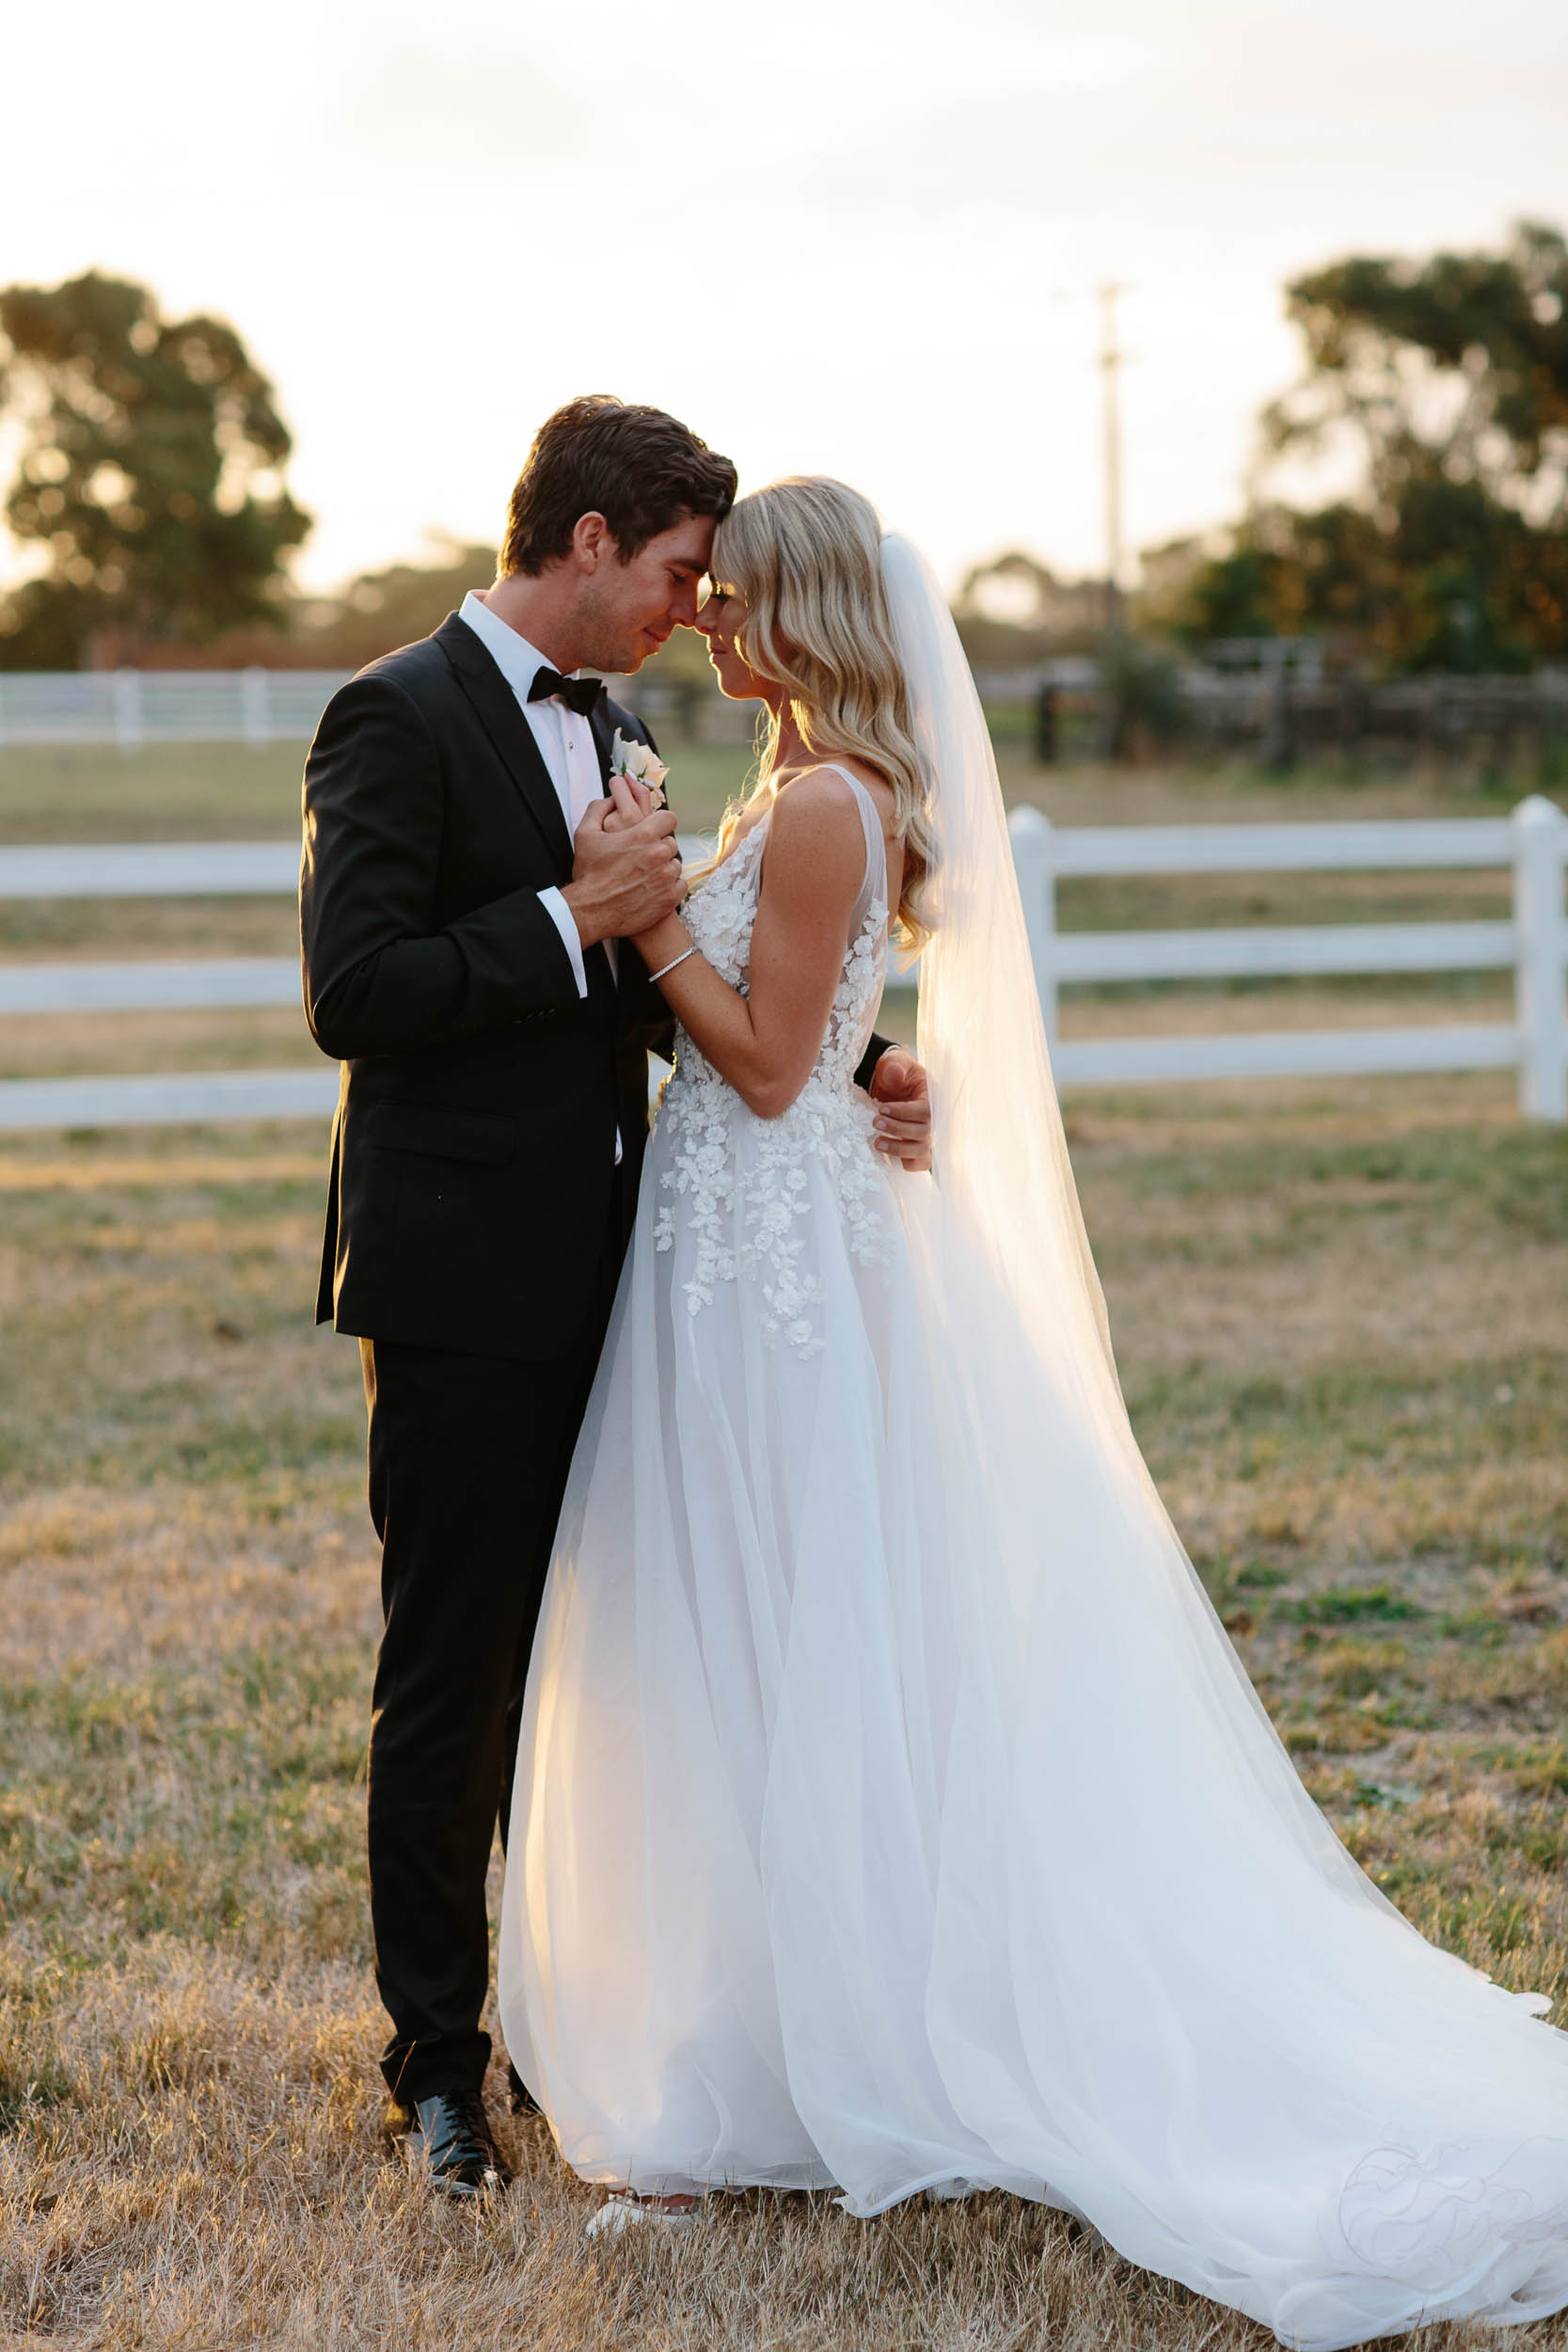 Kas-Richards-Mornington-Peninsula-Private-Property-Wedding-Marianna-Hardwick-Gown-682.jpg